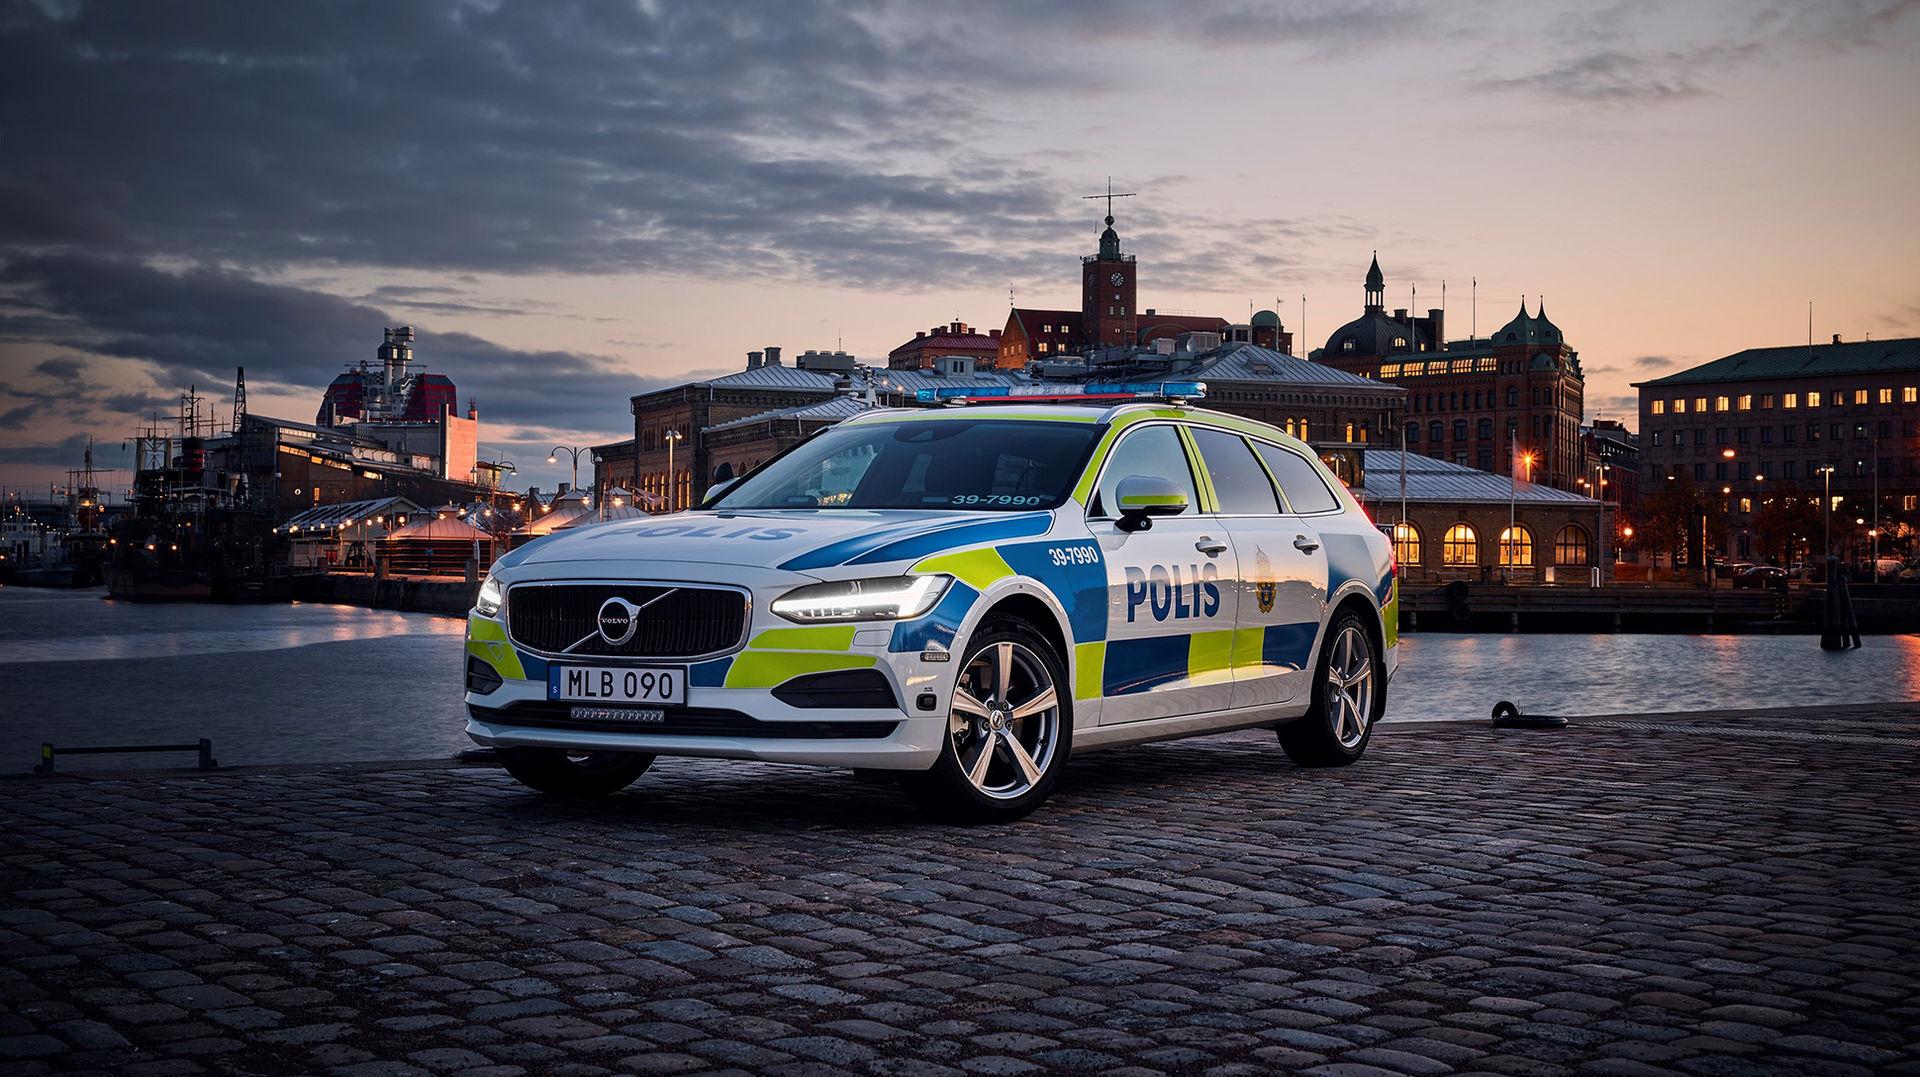 Polisen i Sverige får 2200 nya Volvo-bilar